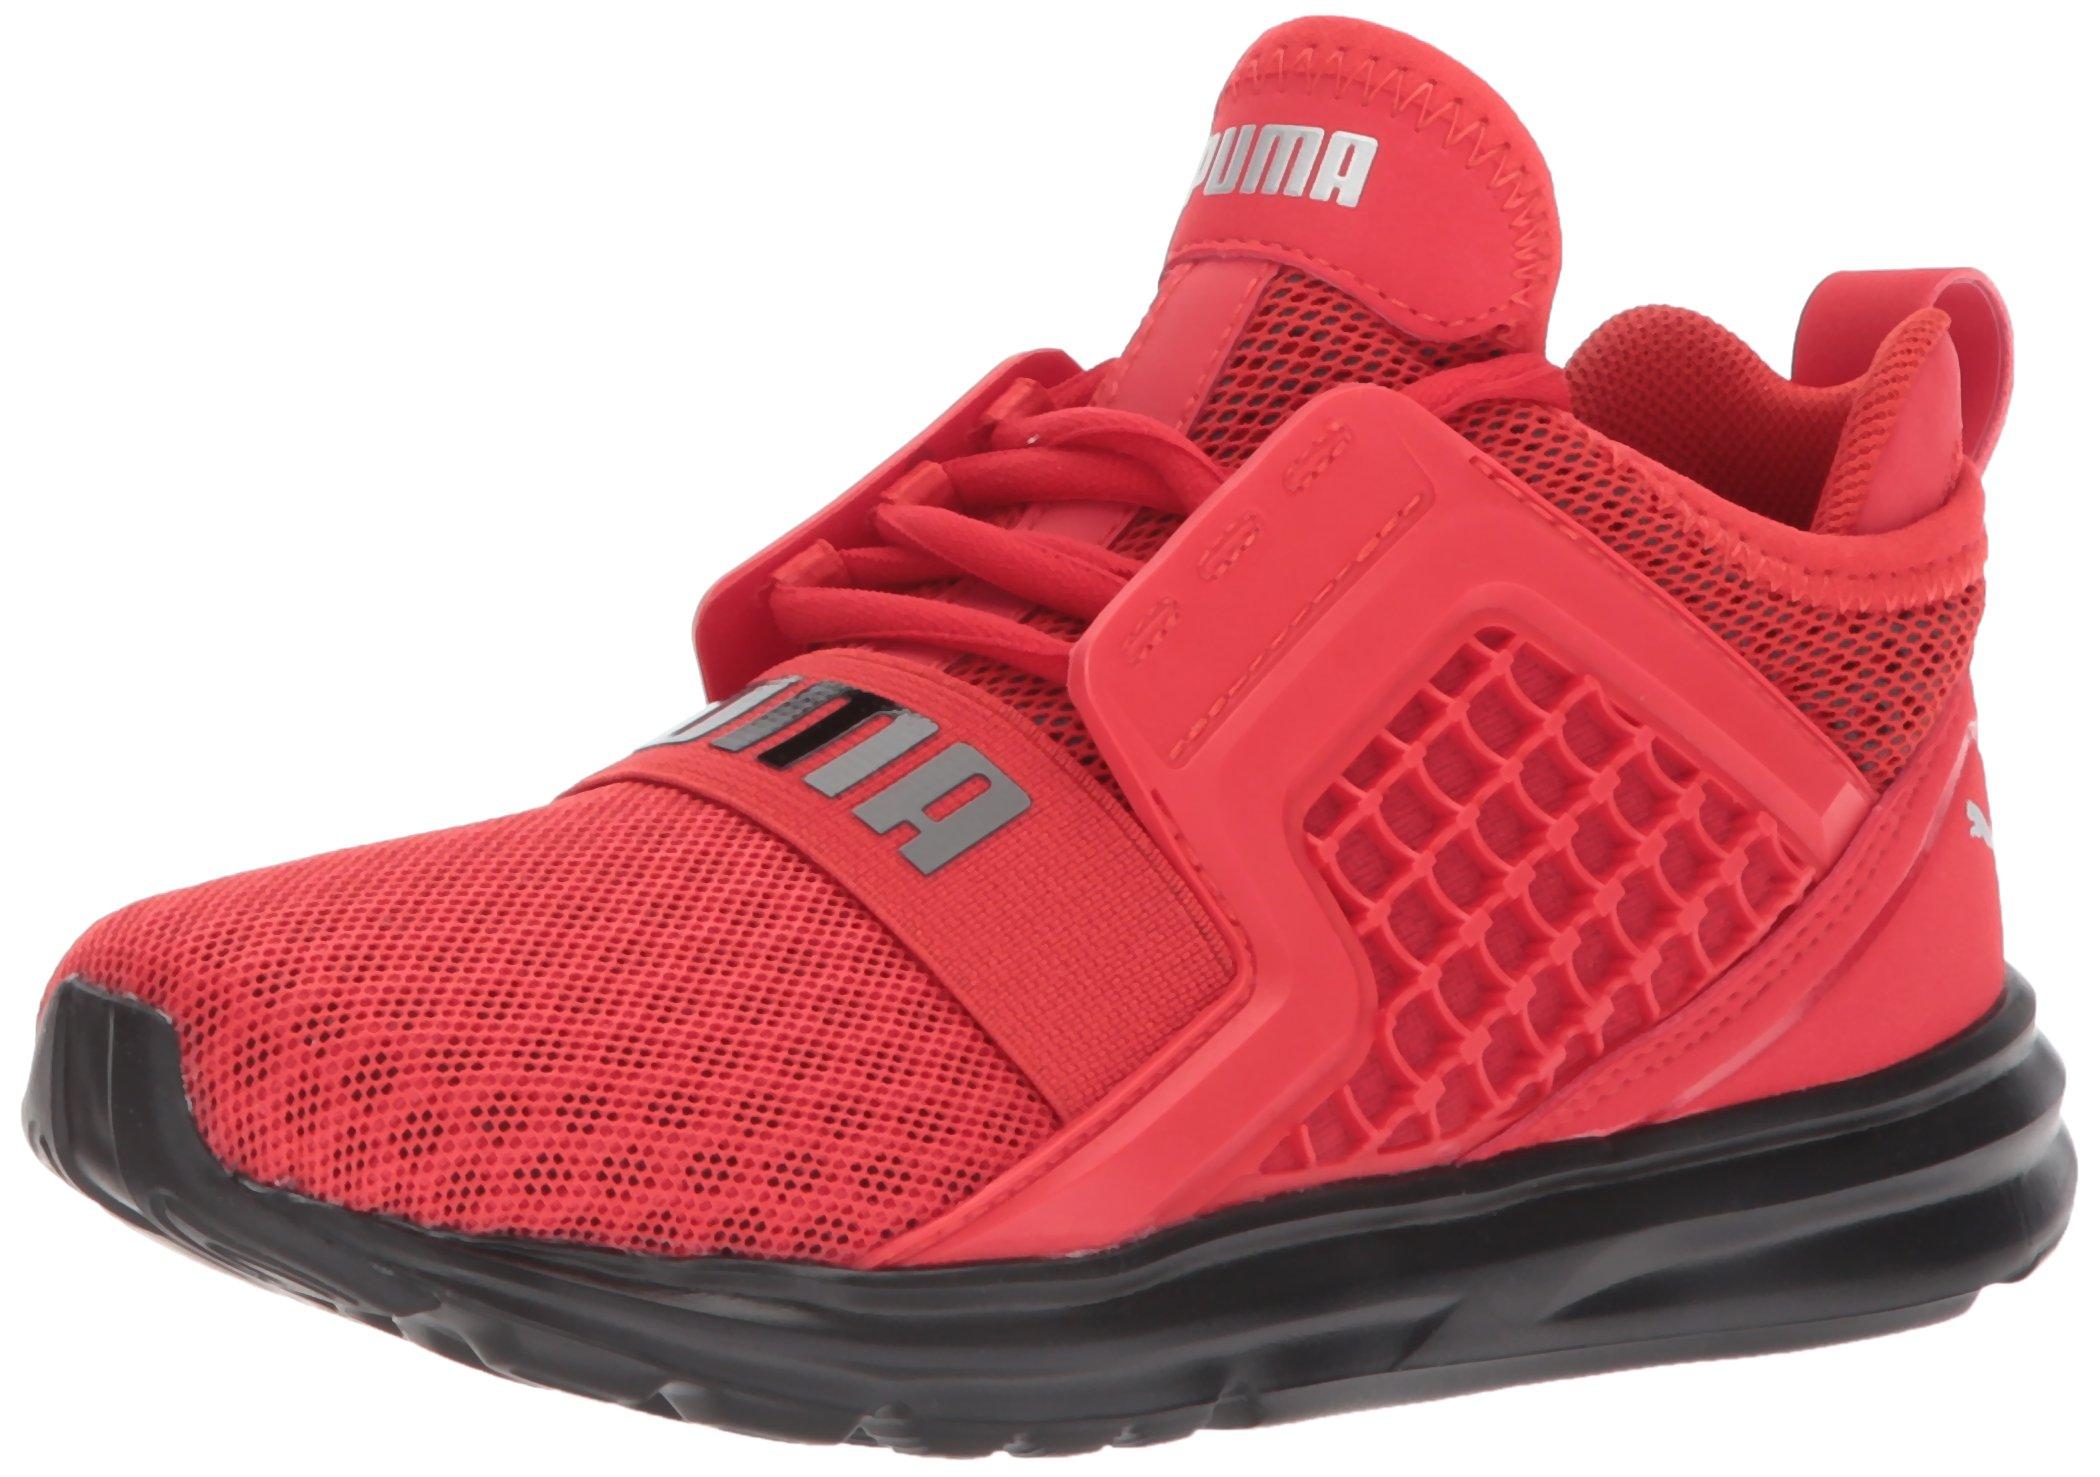 PUMA Unisex-Kids Limitless Sneaker, High Risk Red, 2.5 M US Little Kid